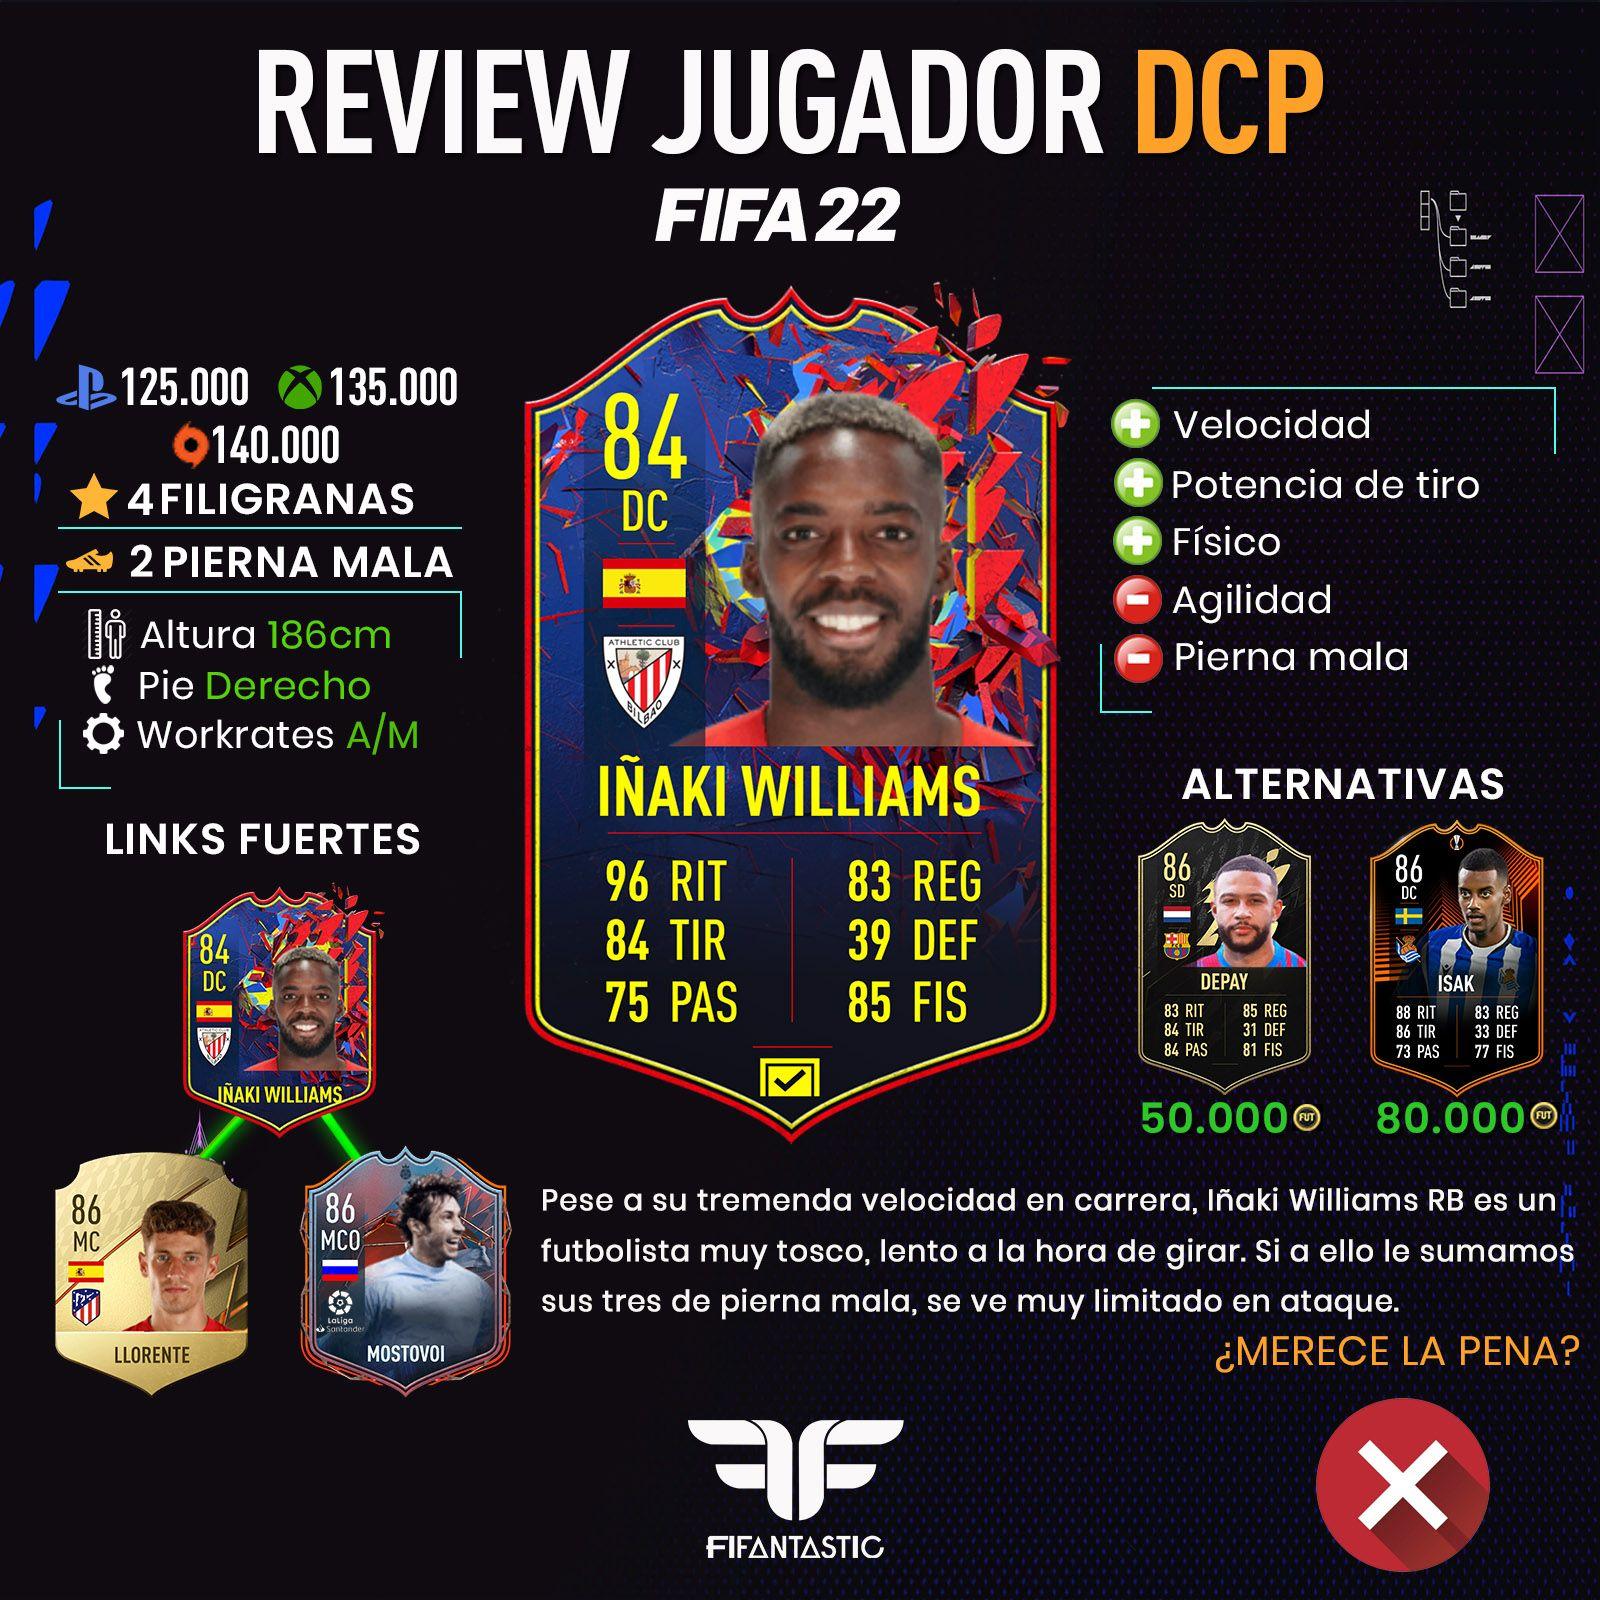 Iñaki Williams Record Breaker en FIFA 22 Ultimate Team